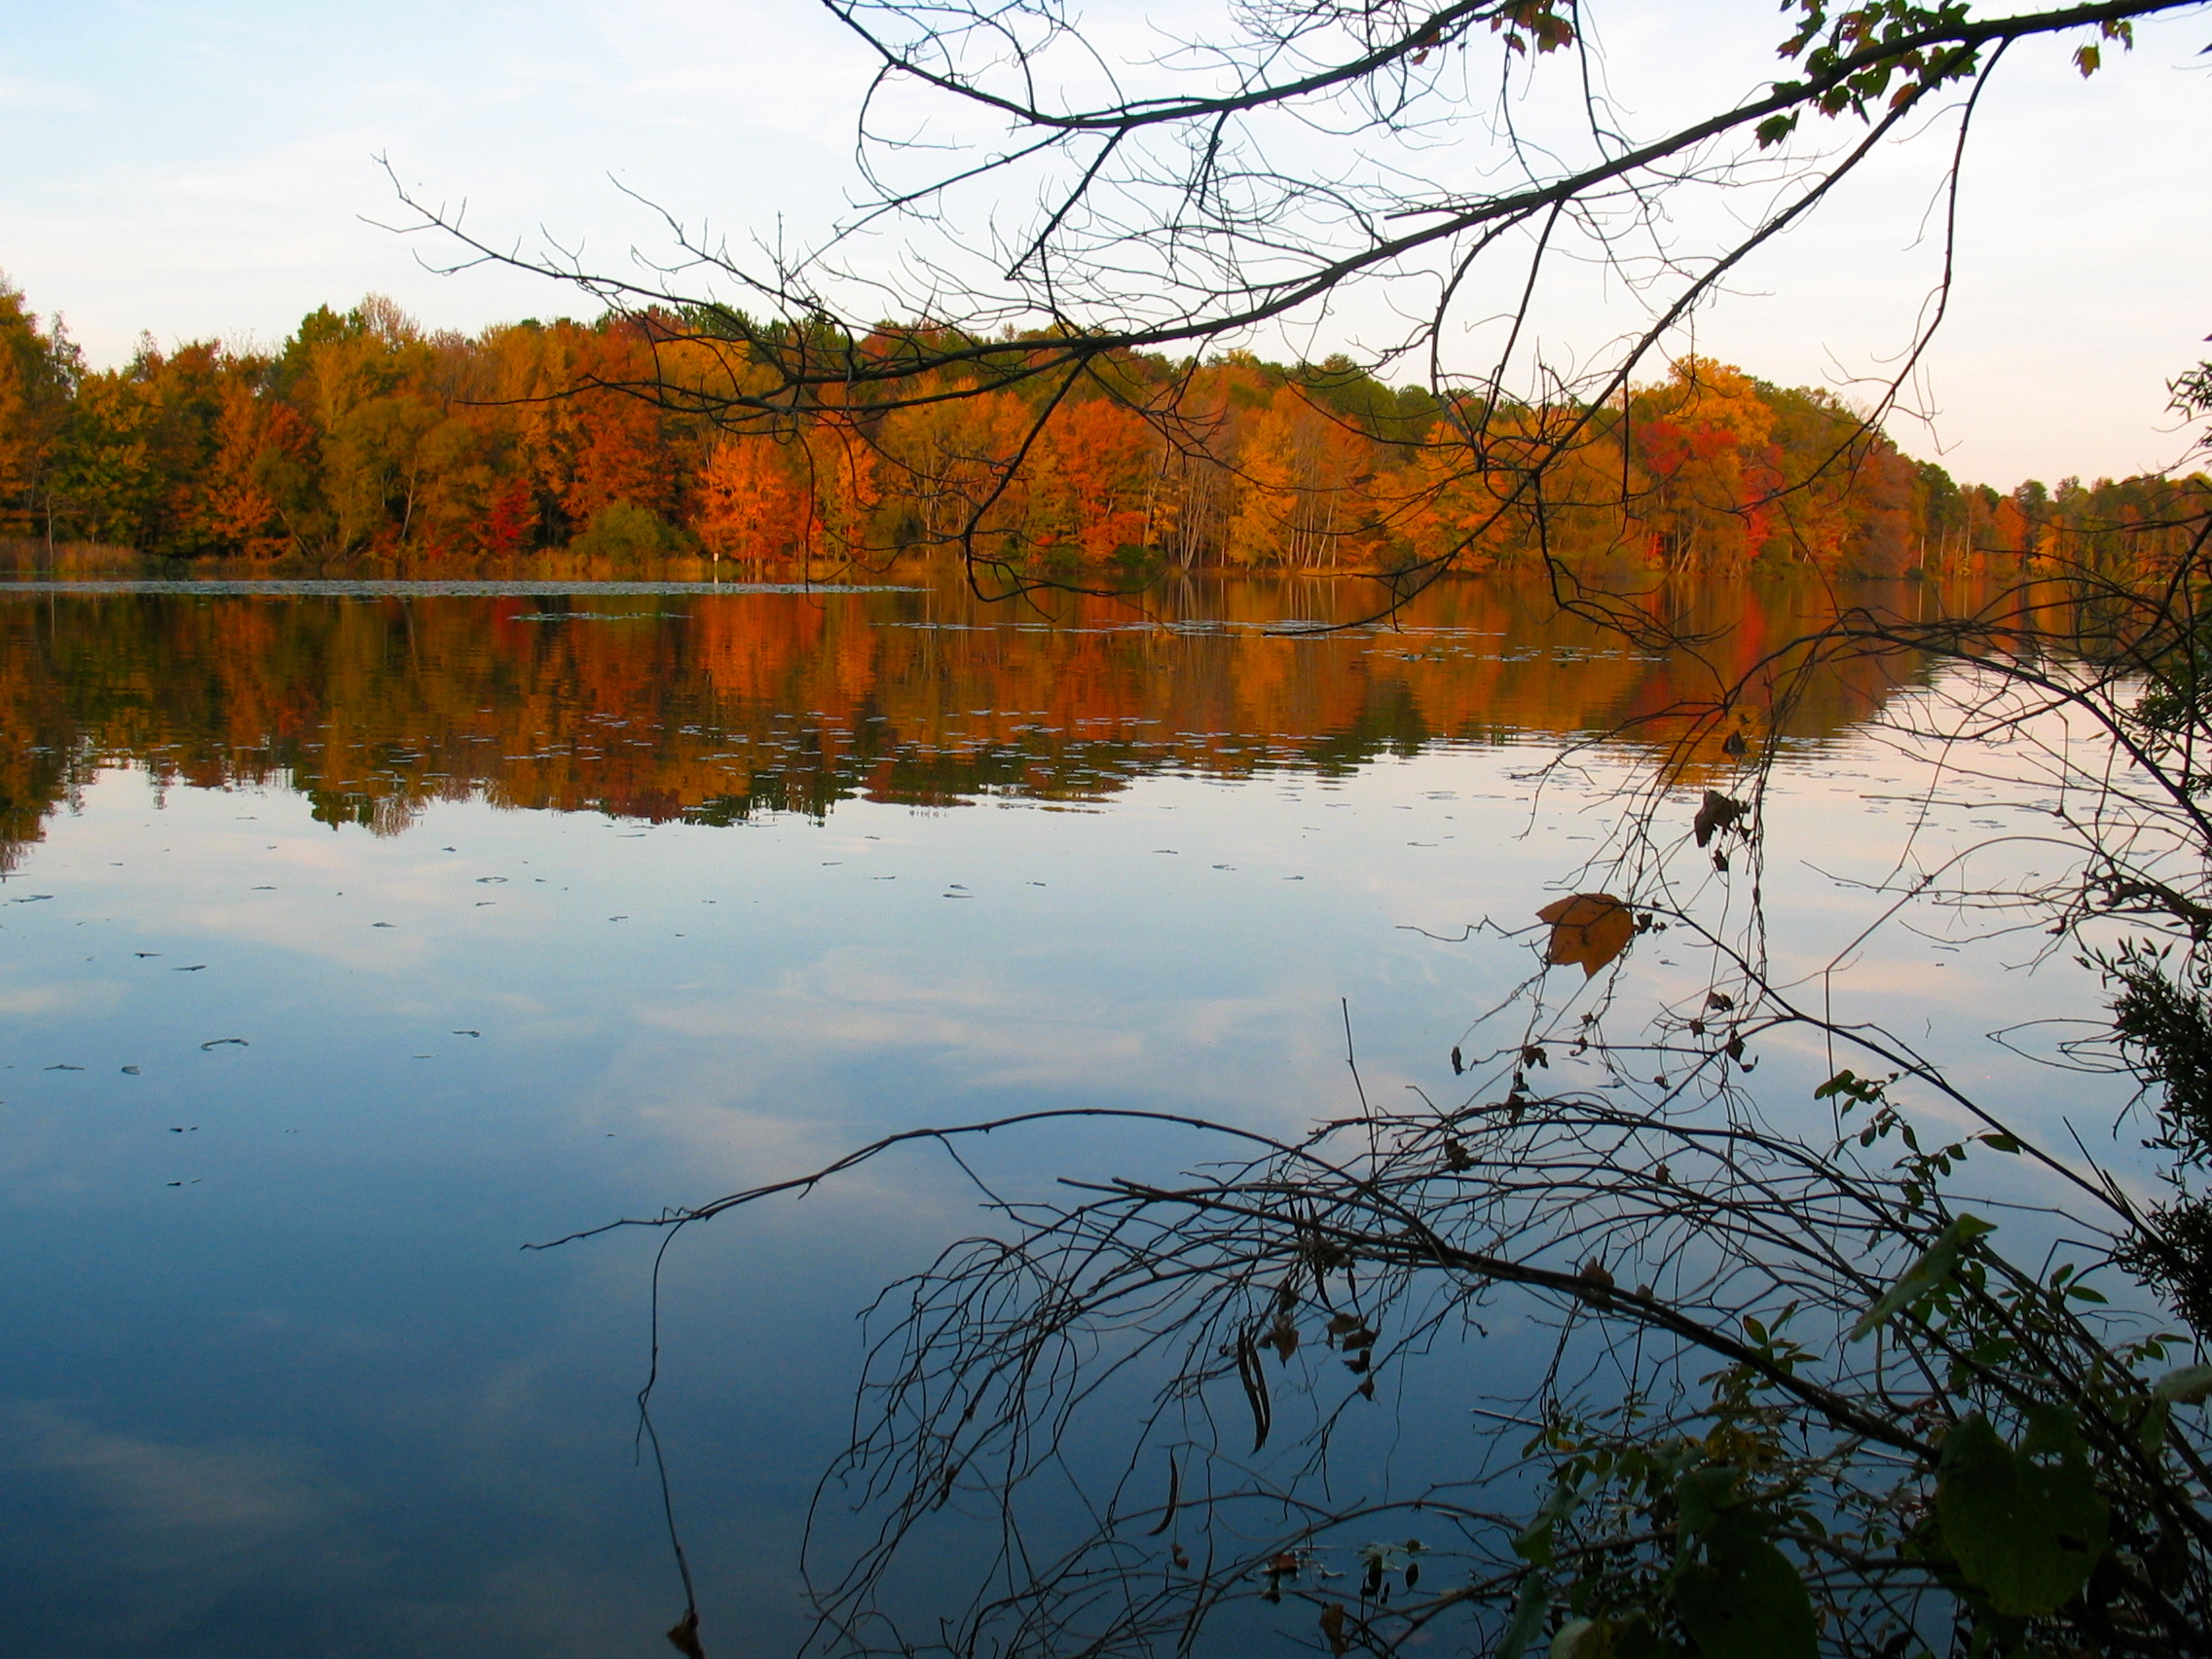 Protecting North Carolina's Fall Splendor